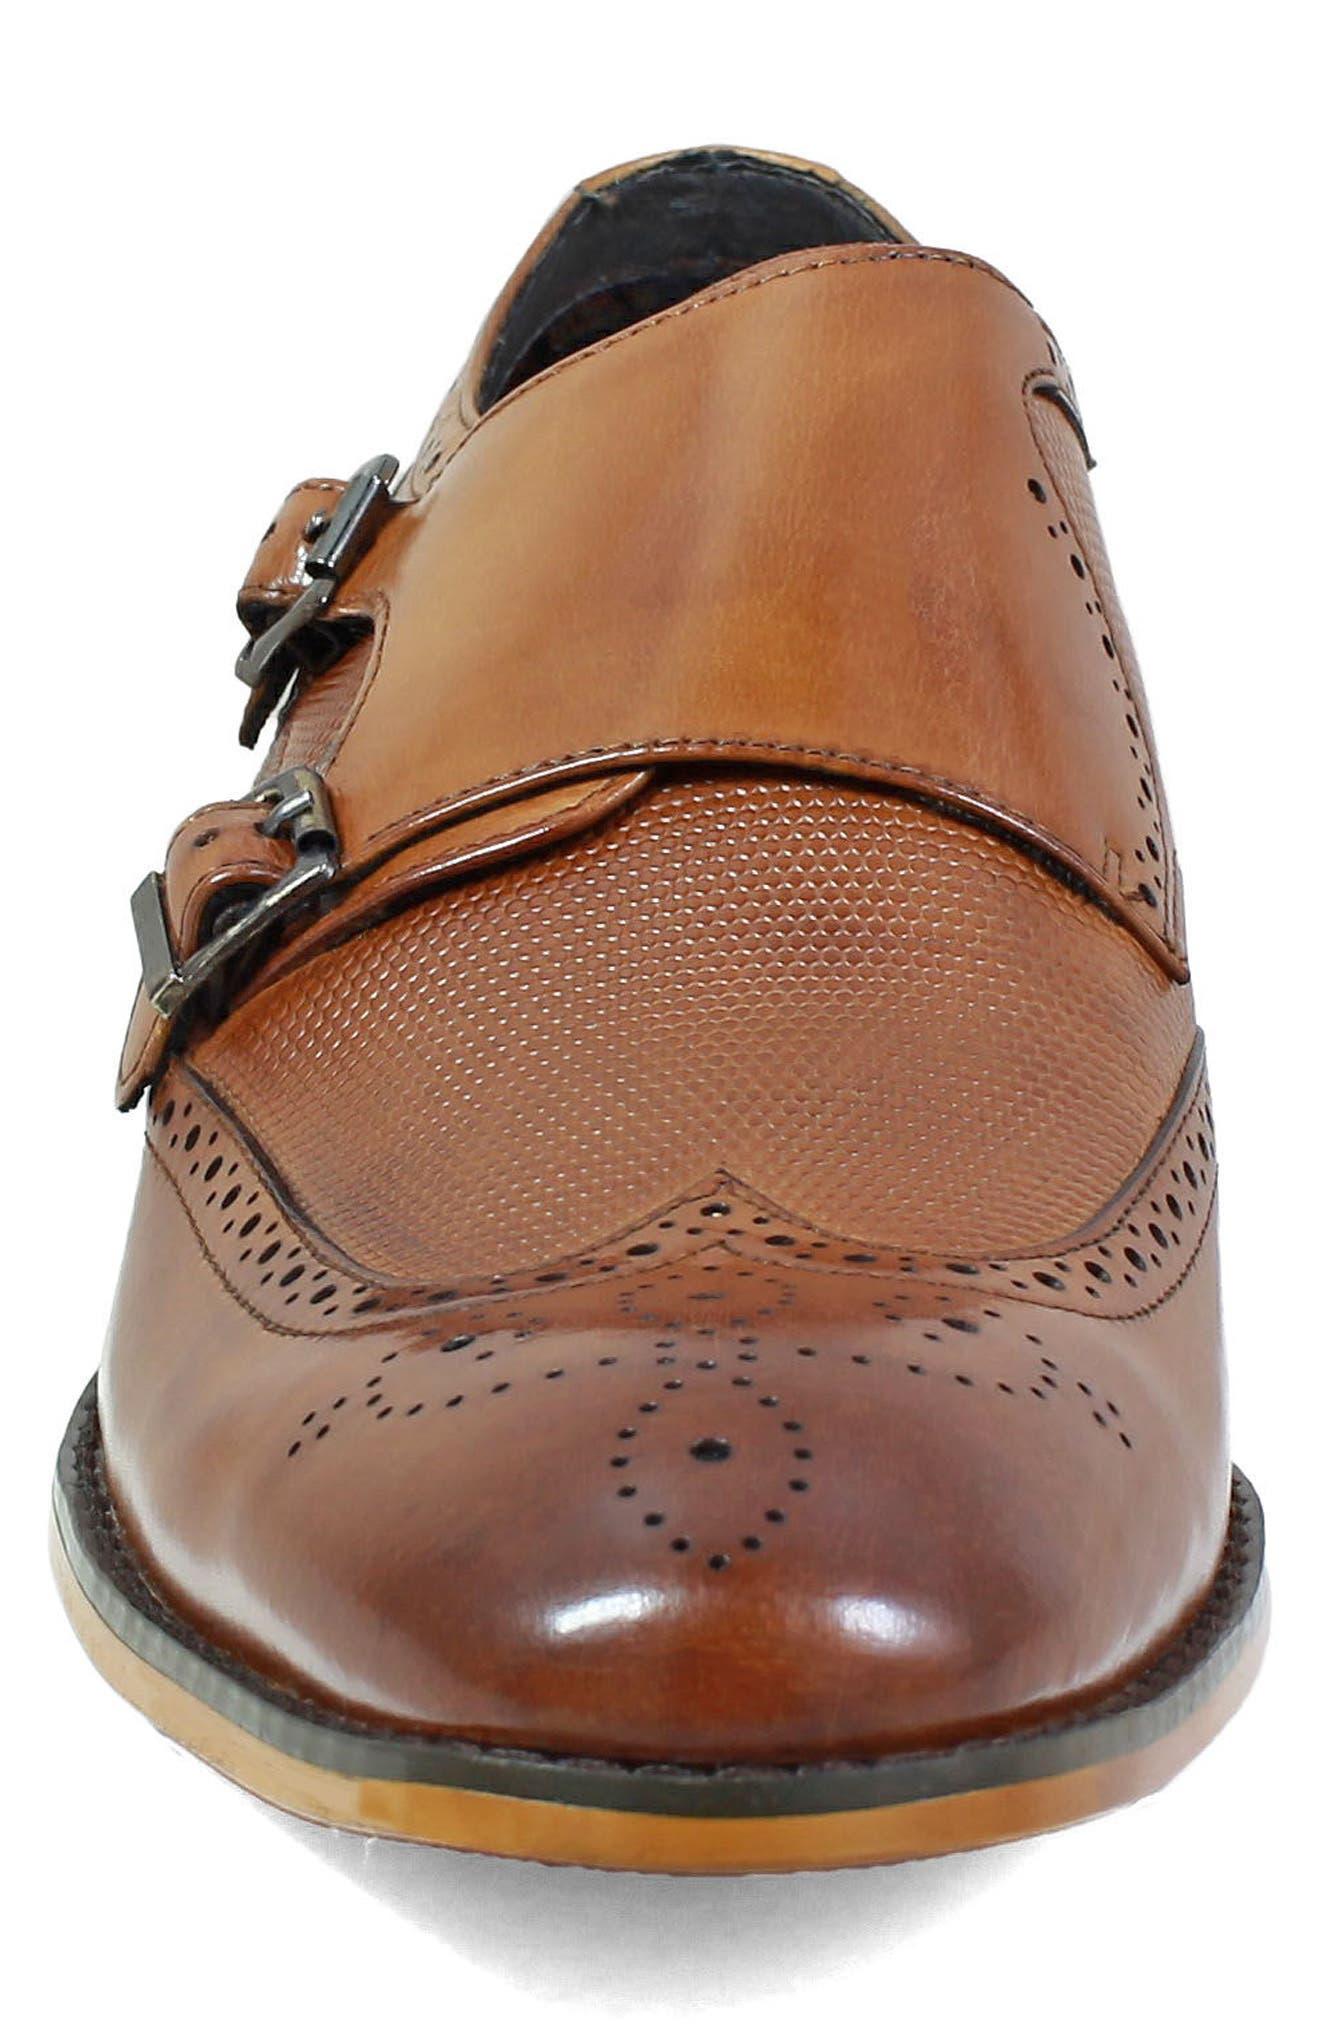 Lavine Wingtip Monk Shoe,                             Alternate thumbnail 4, color,                             SADDLE TAN LEATHER